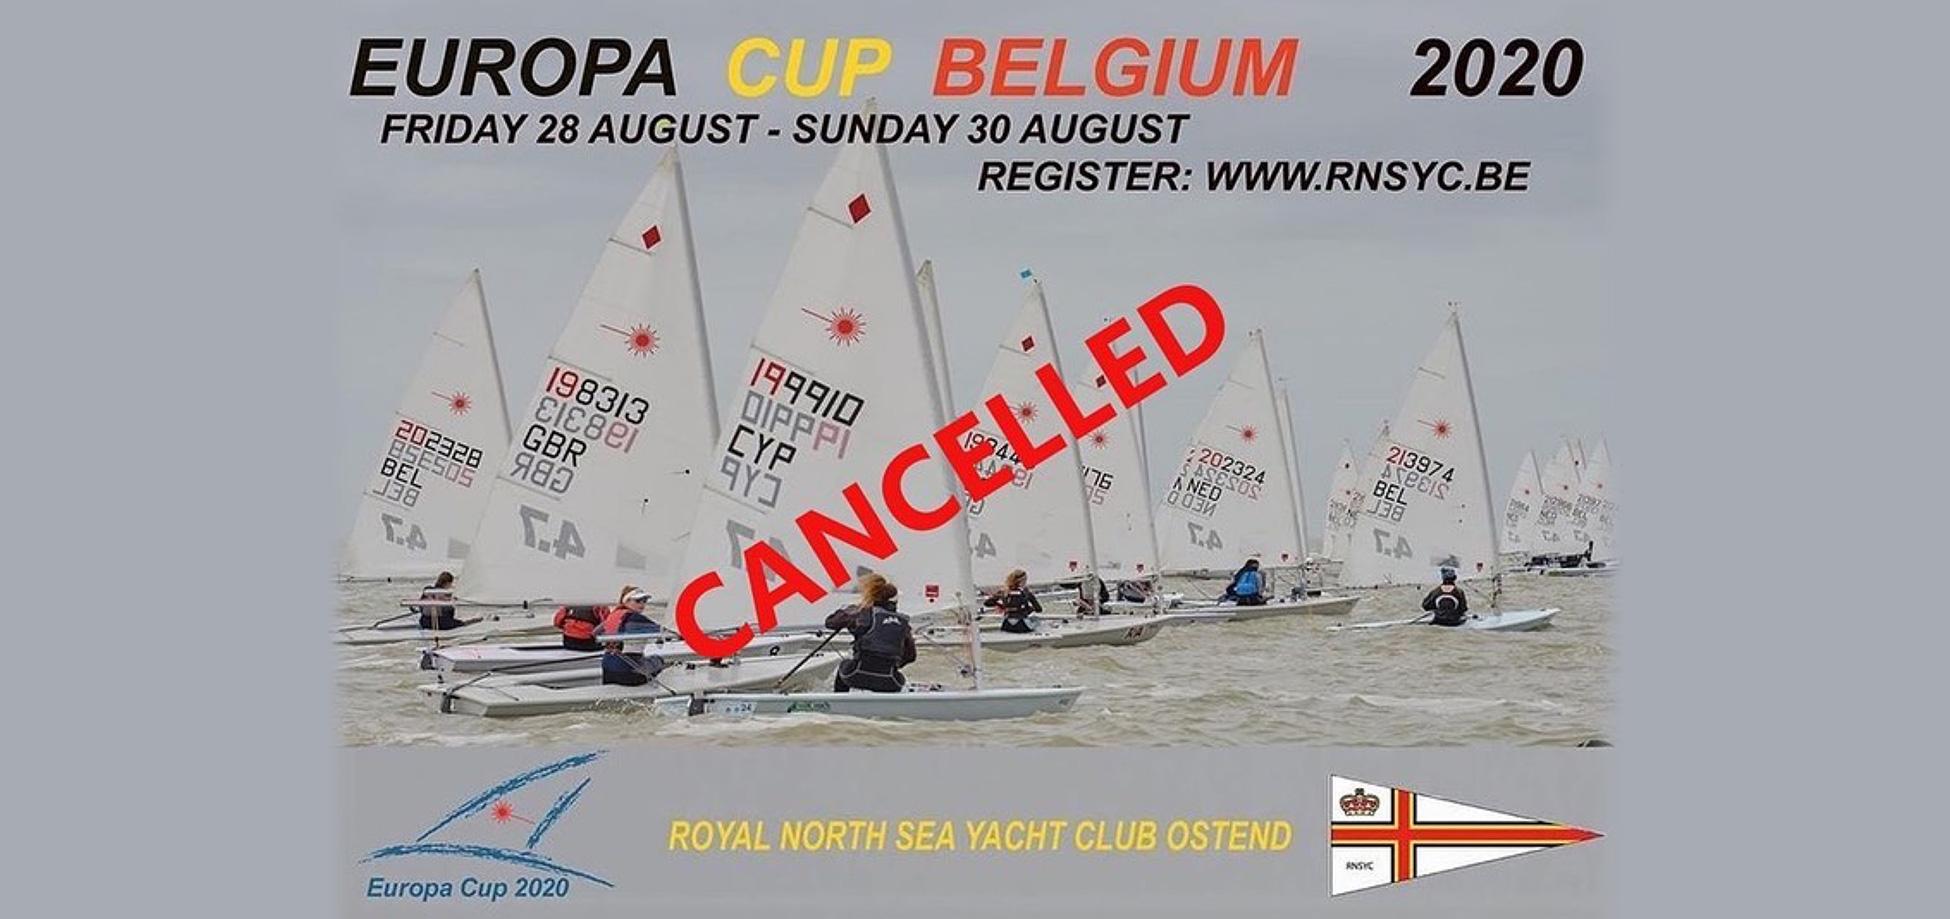 event cancelled in Belgium